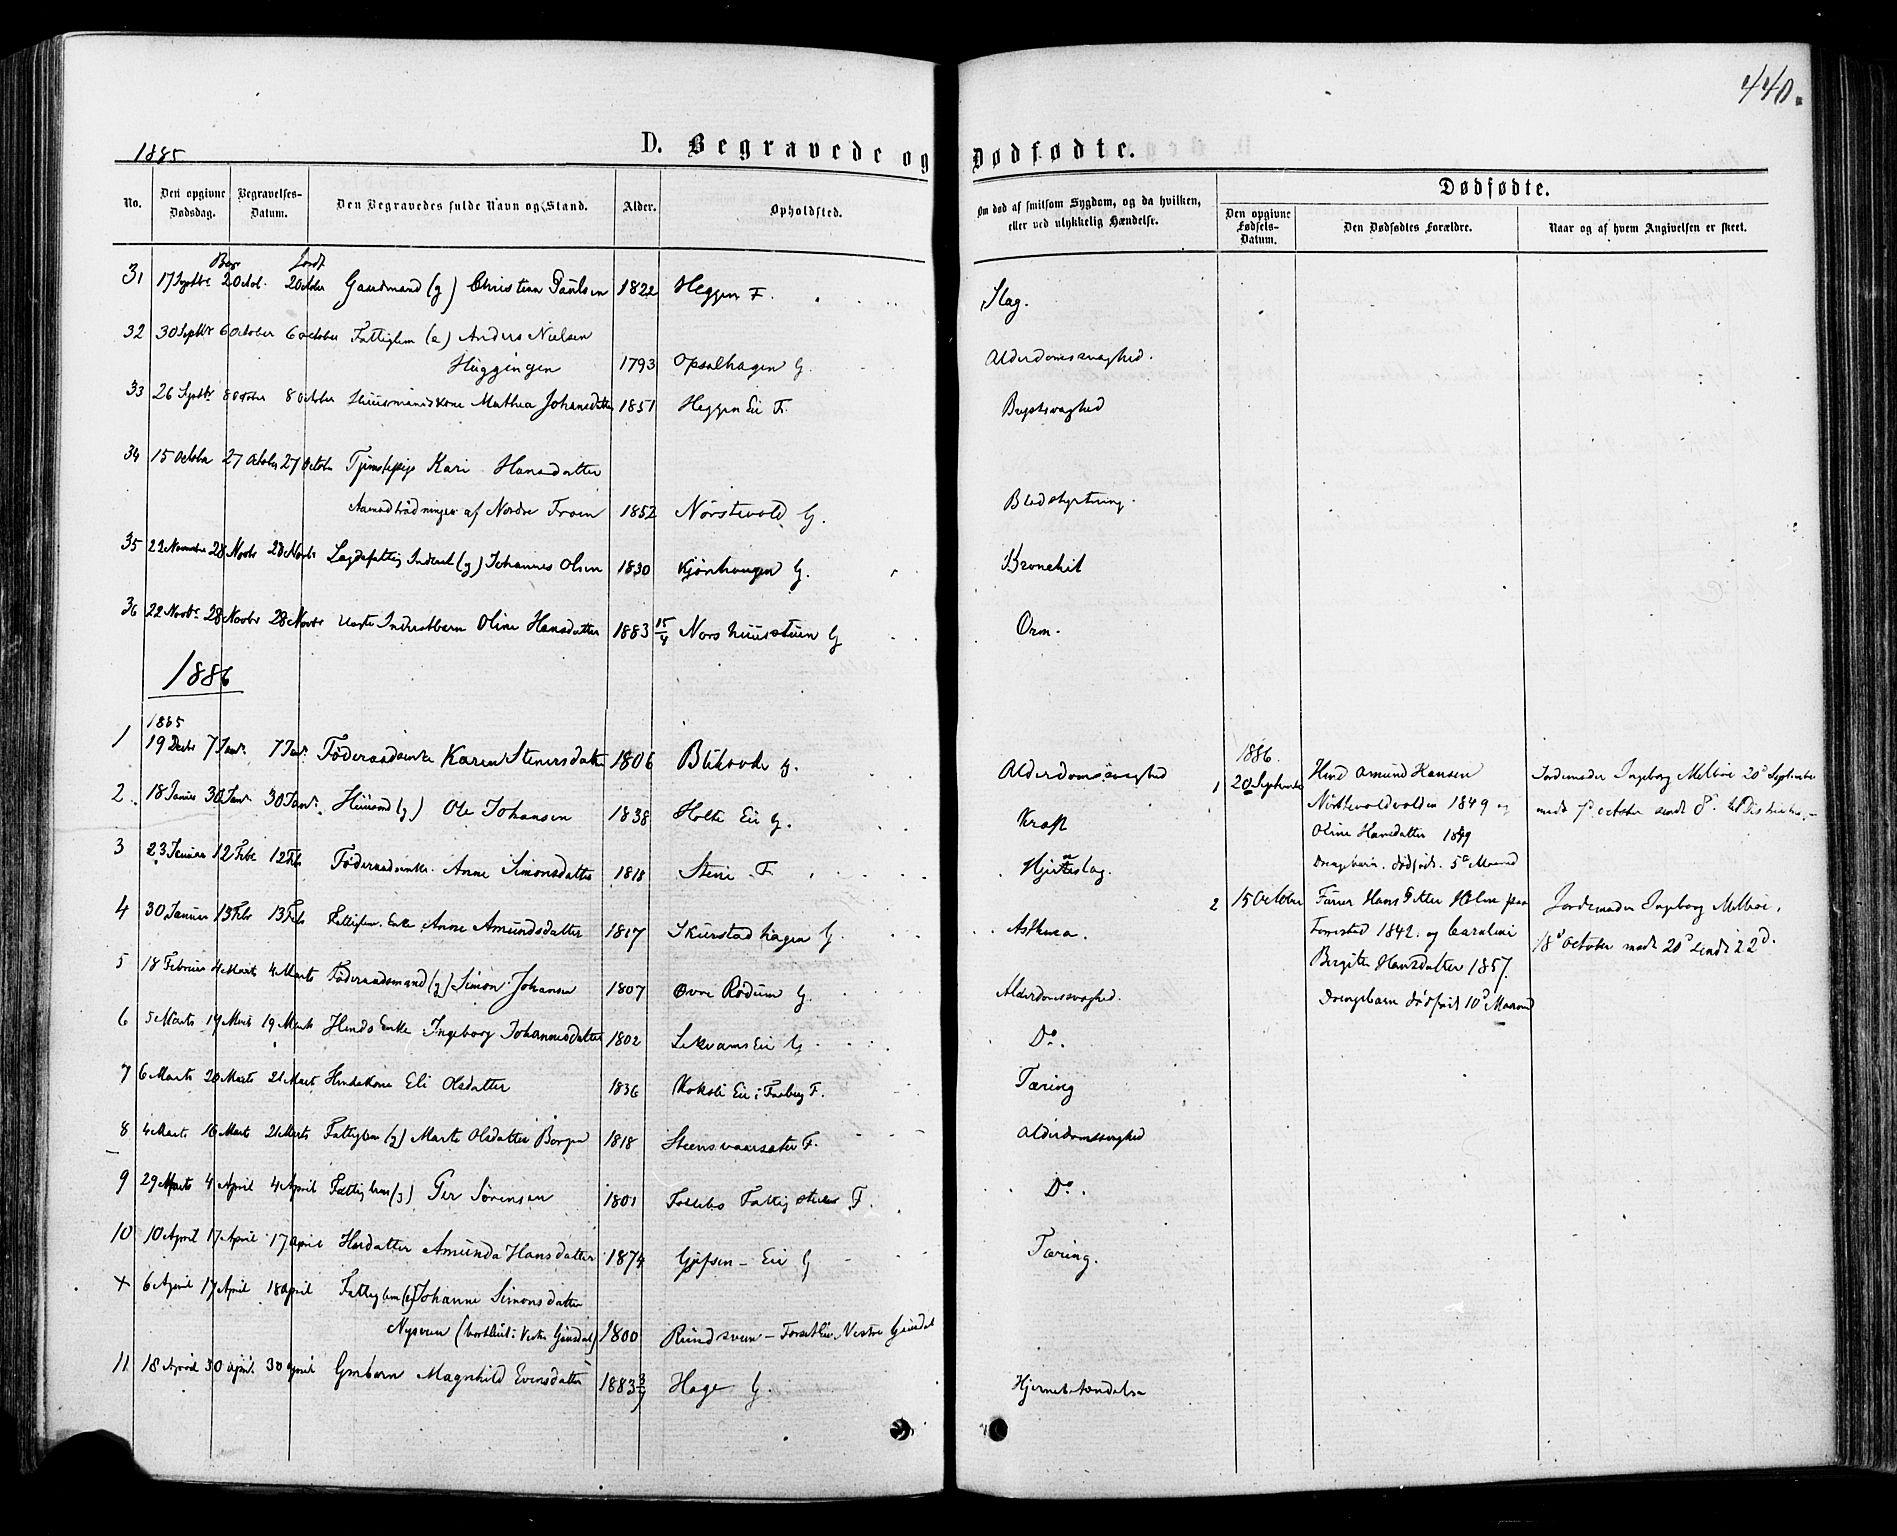 SAH, Østre Gausdal prestekontor, Ministerialbok nr. 1, 1874-1886, s. 440